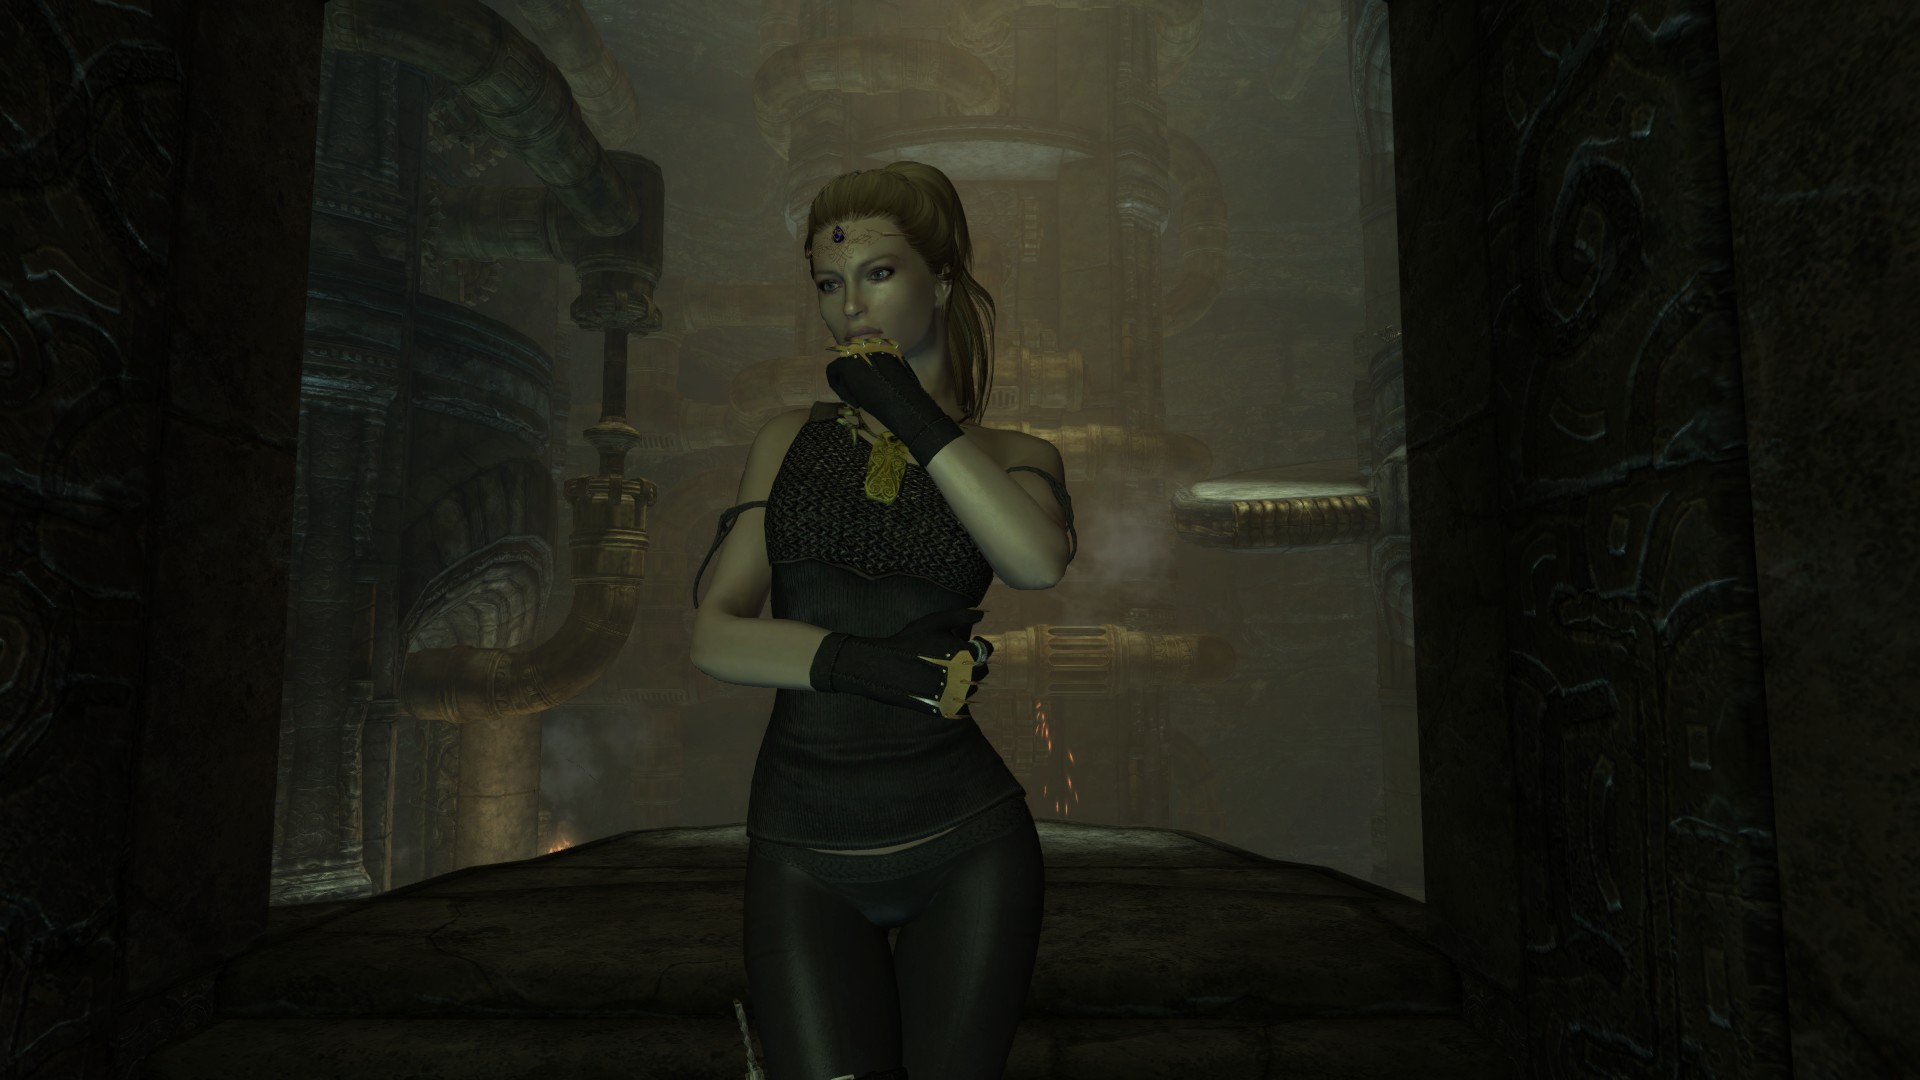 20180721190731_1.jpg - Elder Scrolls 5: Skyrim, the